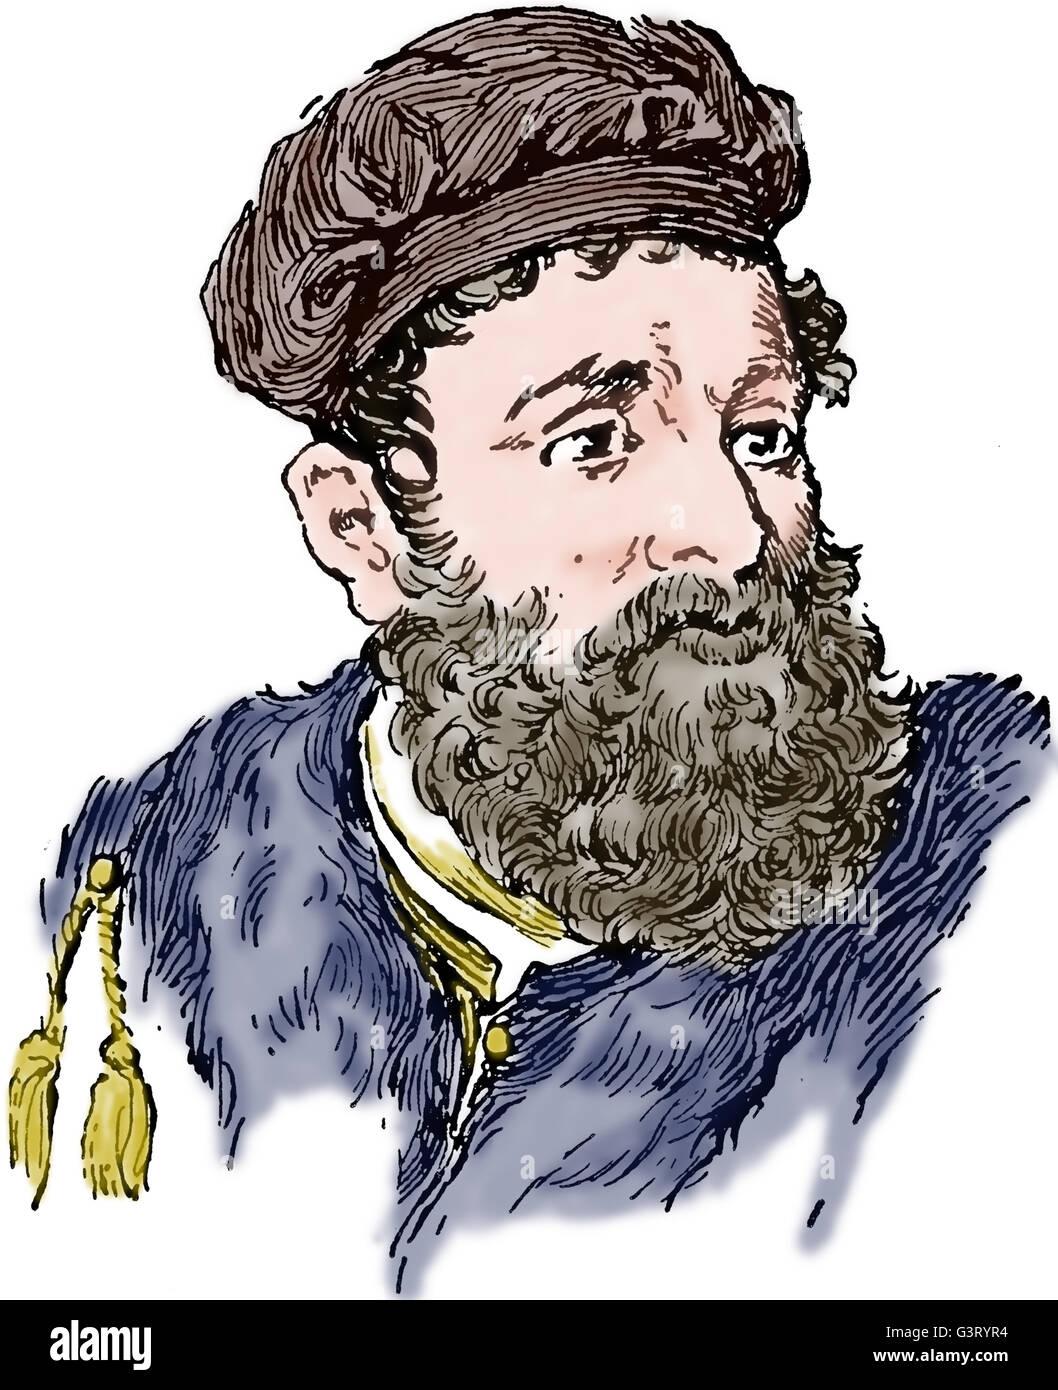 Marco Polo (1254-1324). Venetian merchant traveller. Engraving. Portrait. Color. 19th c. - Stock Image